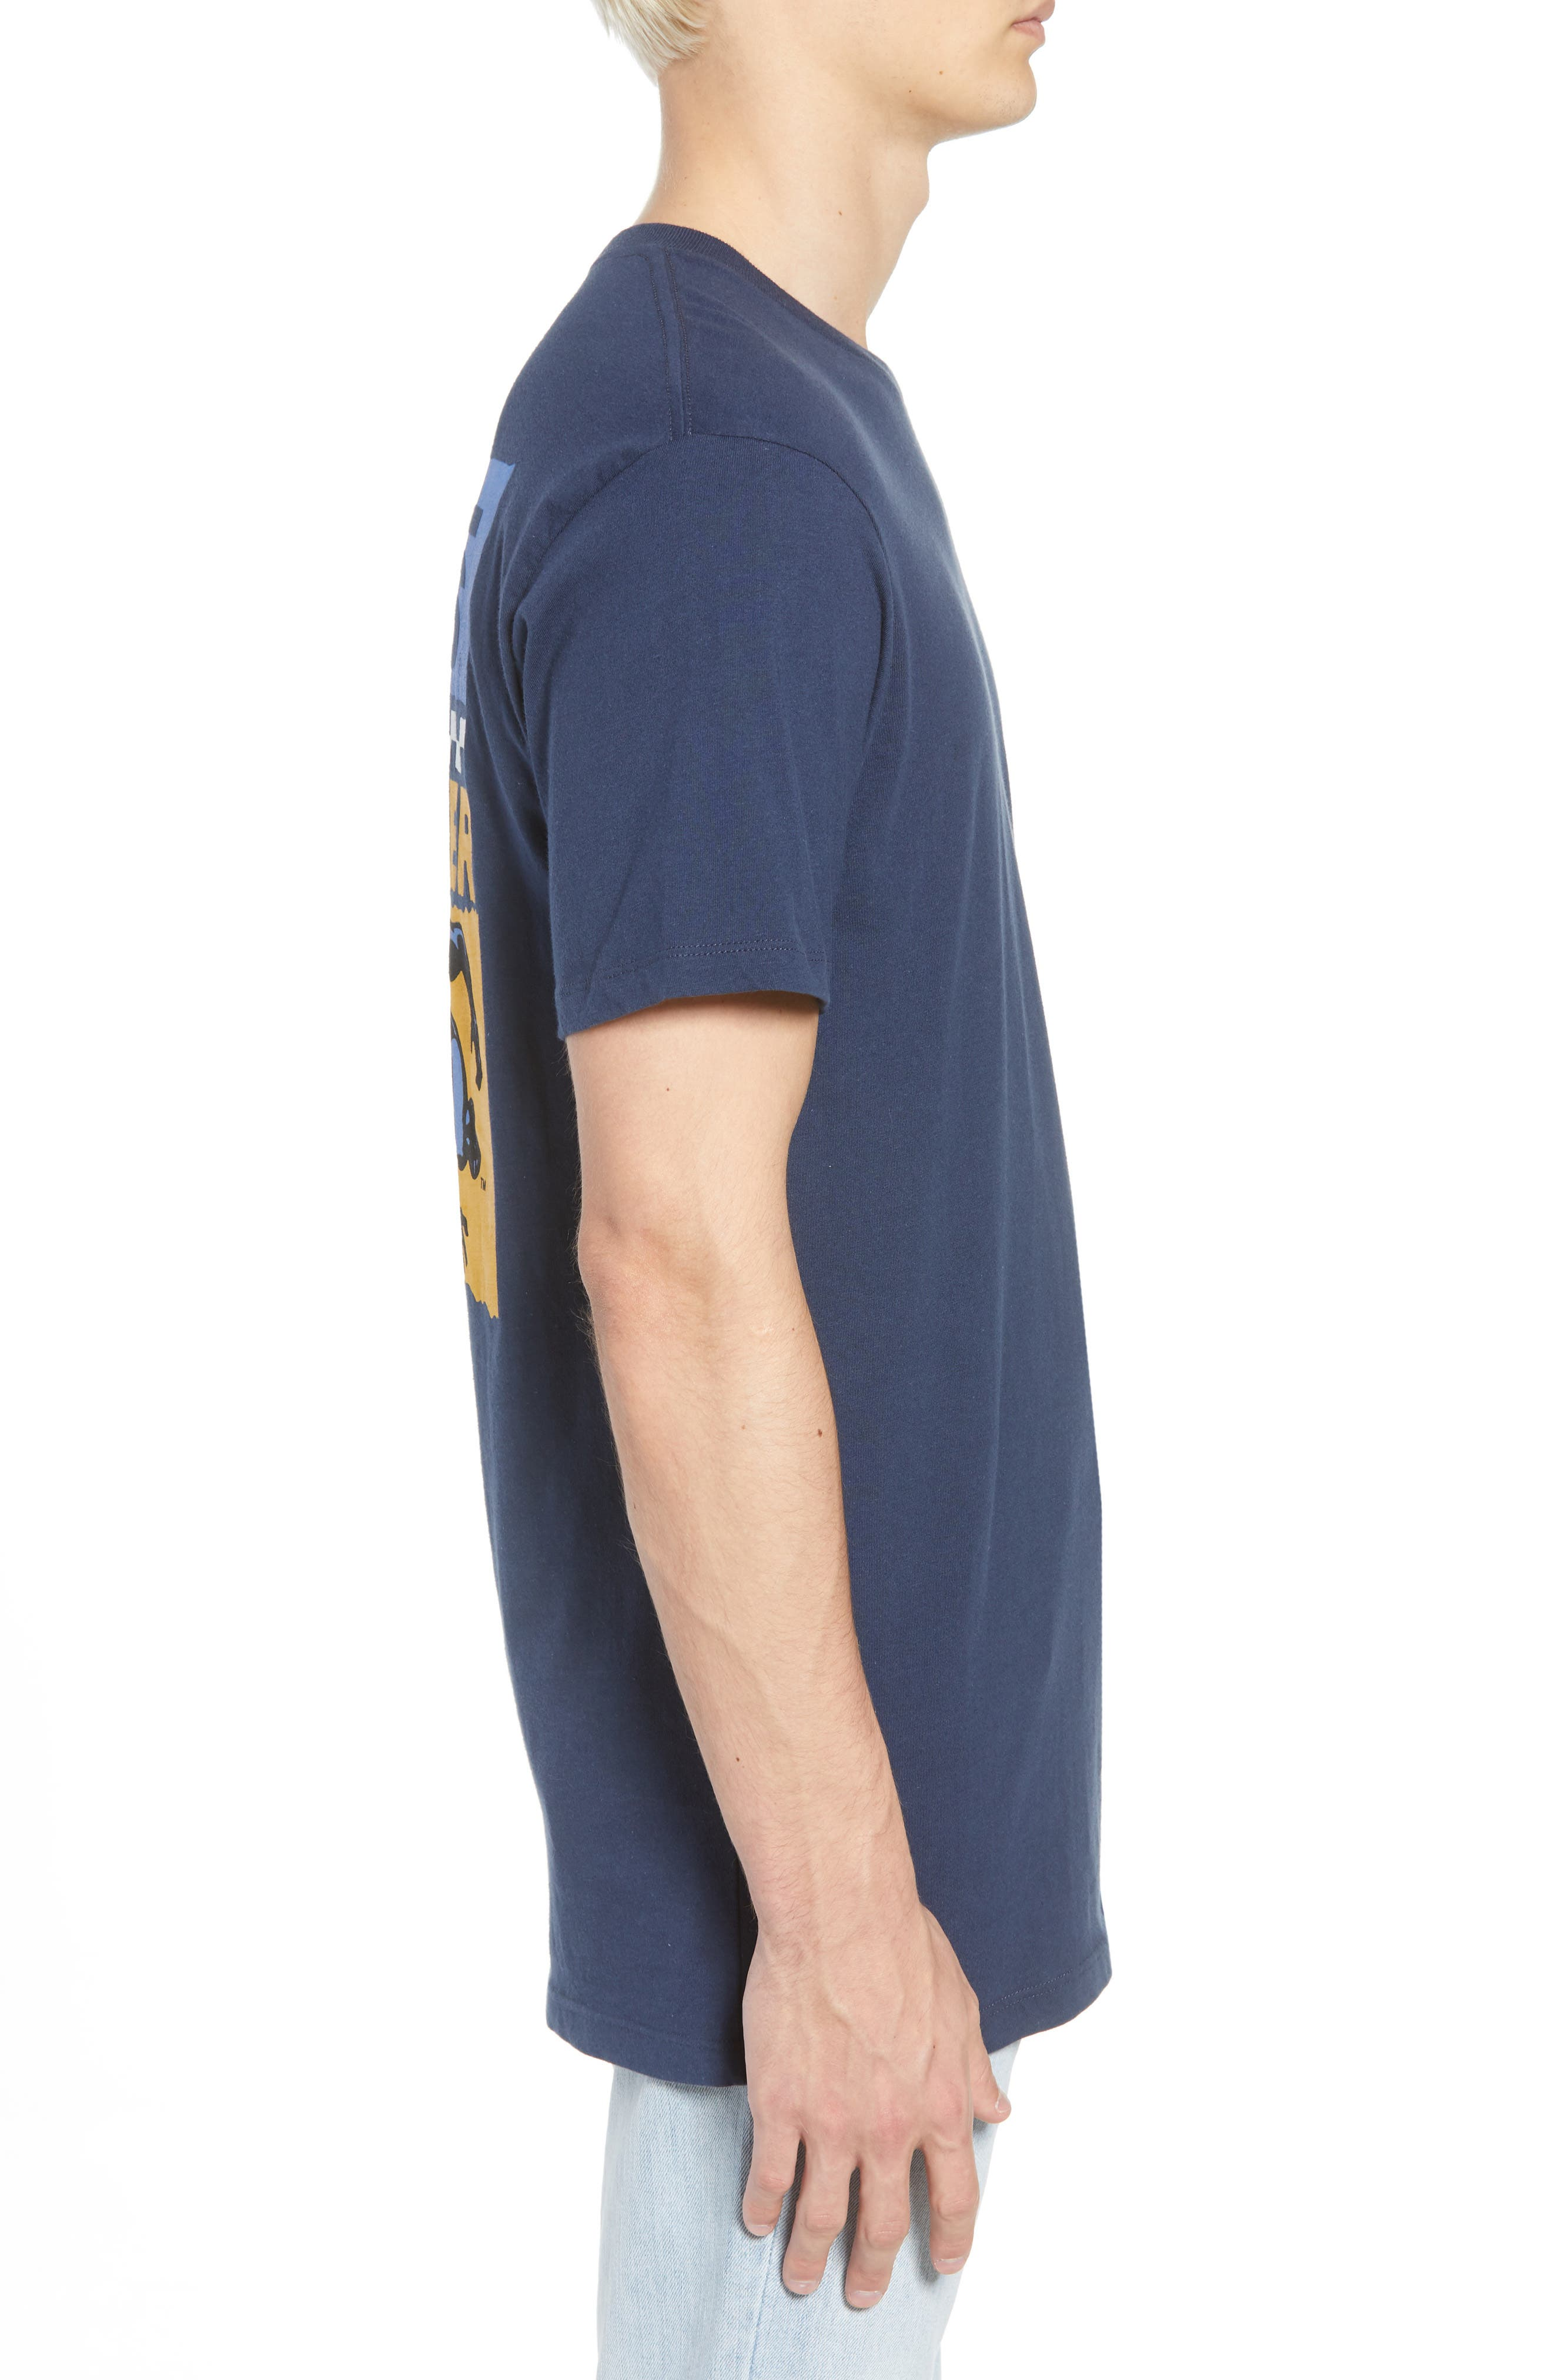 x Marvel<sup>®</sup> Black Panther T-Shirt,                             Alternate thumbnail 3, color,                             401